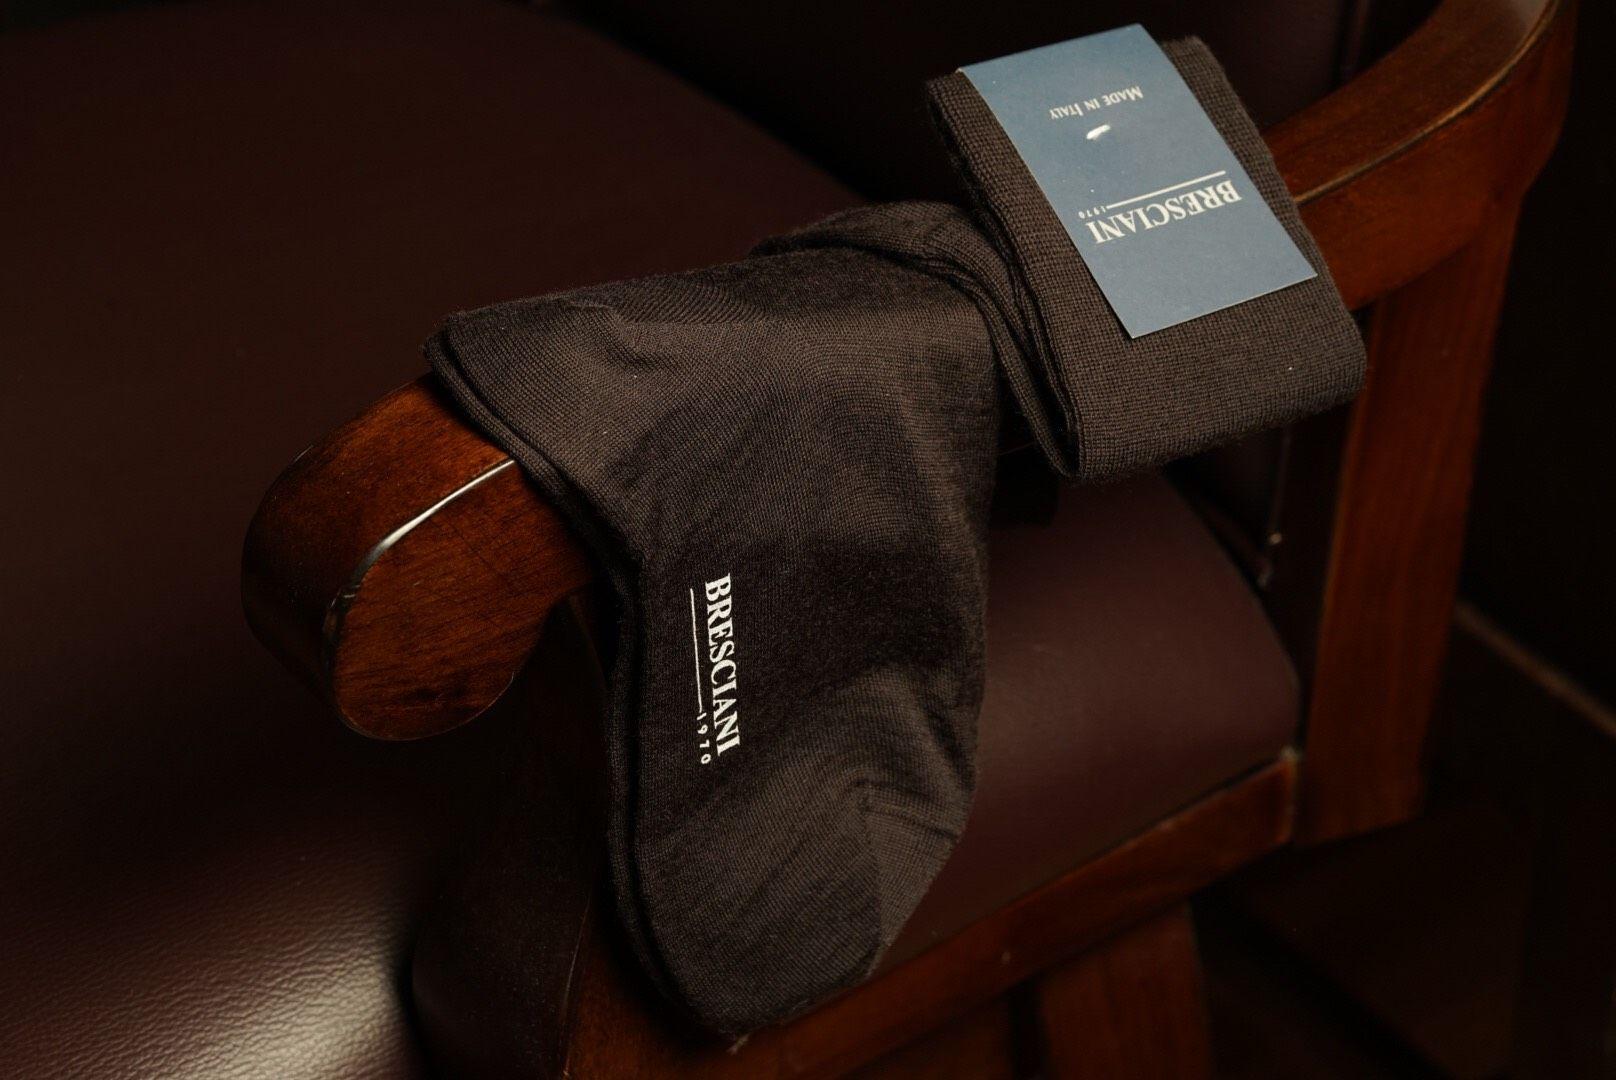 Bresciani Over Calf sock - Caffe II